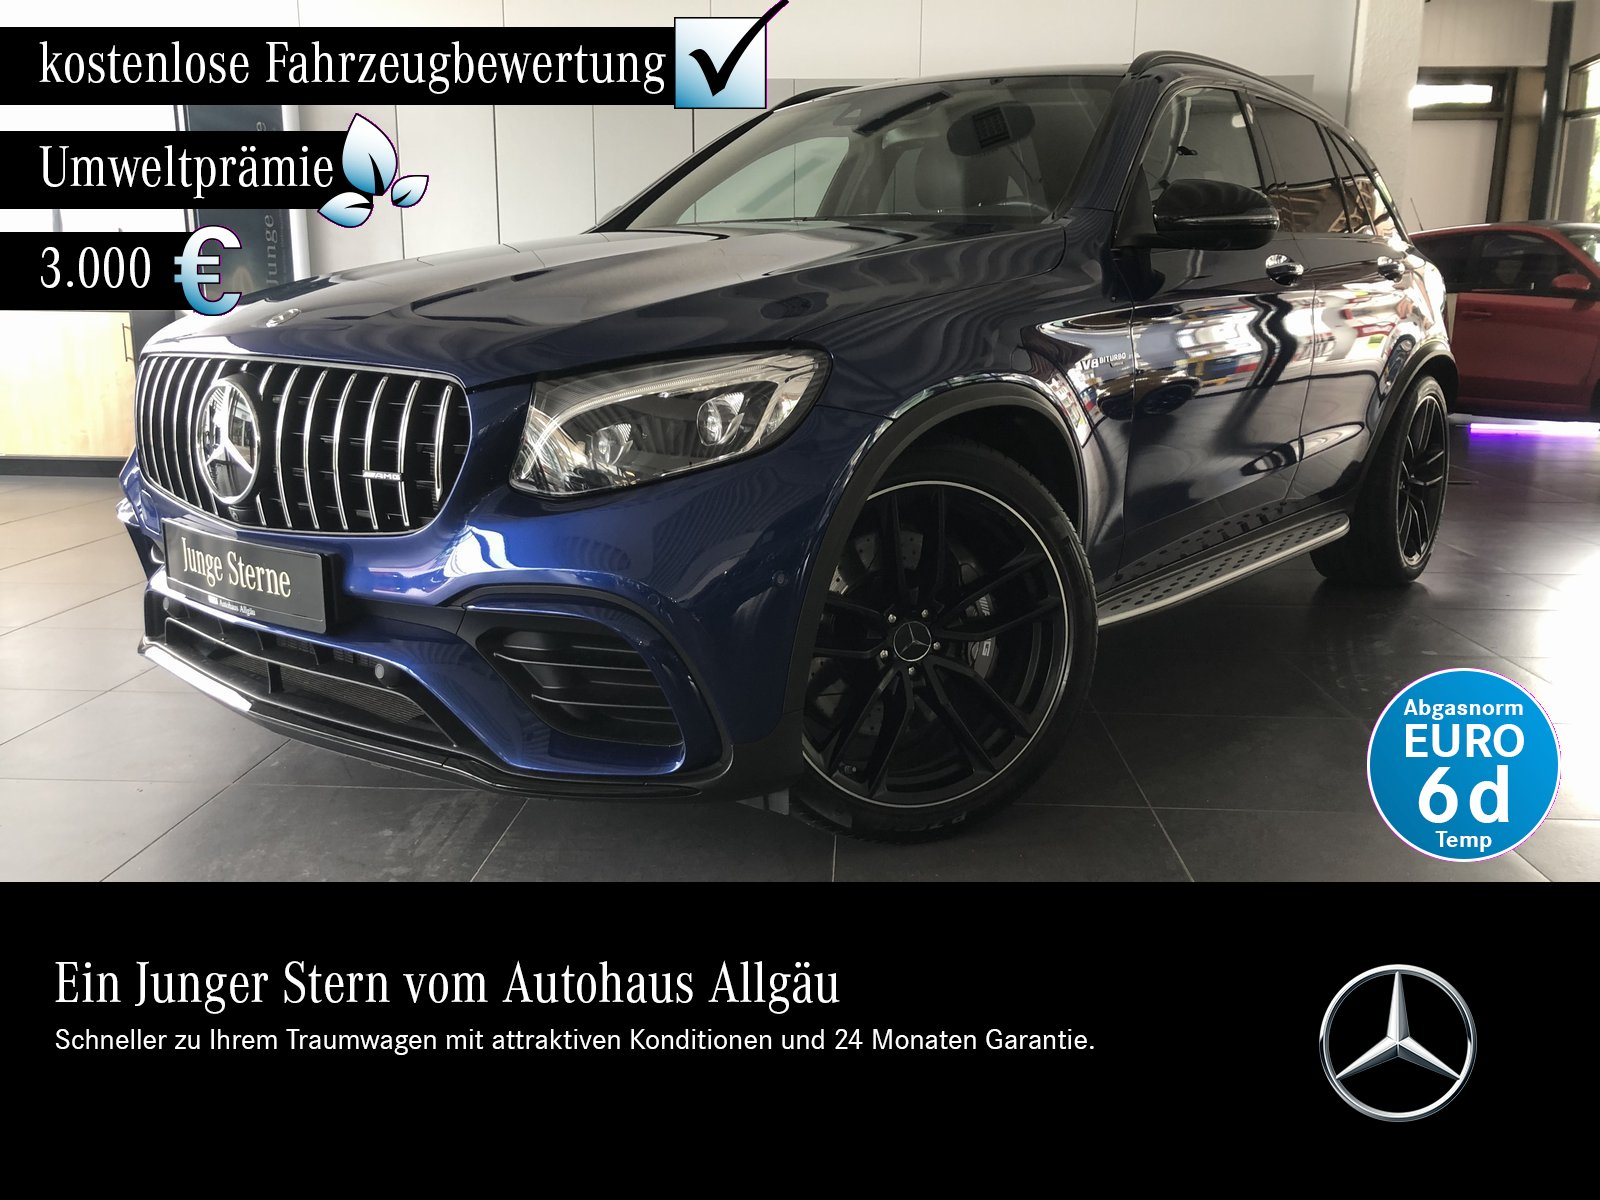 Mercedes-Benz GLC 63 AMG 4M +Comand+Headup+Distronic+AHK+Pano+, Jahr 2018, Benzin